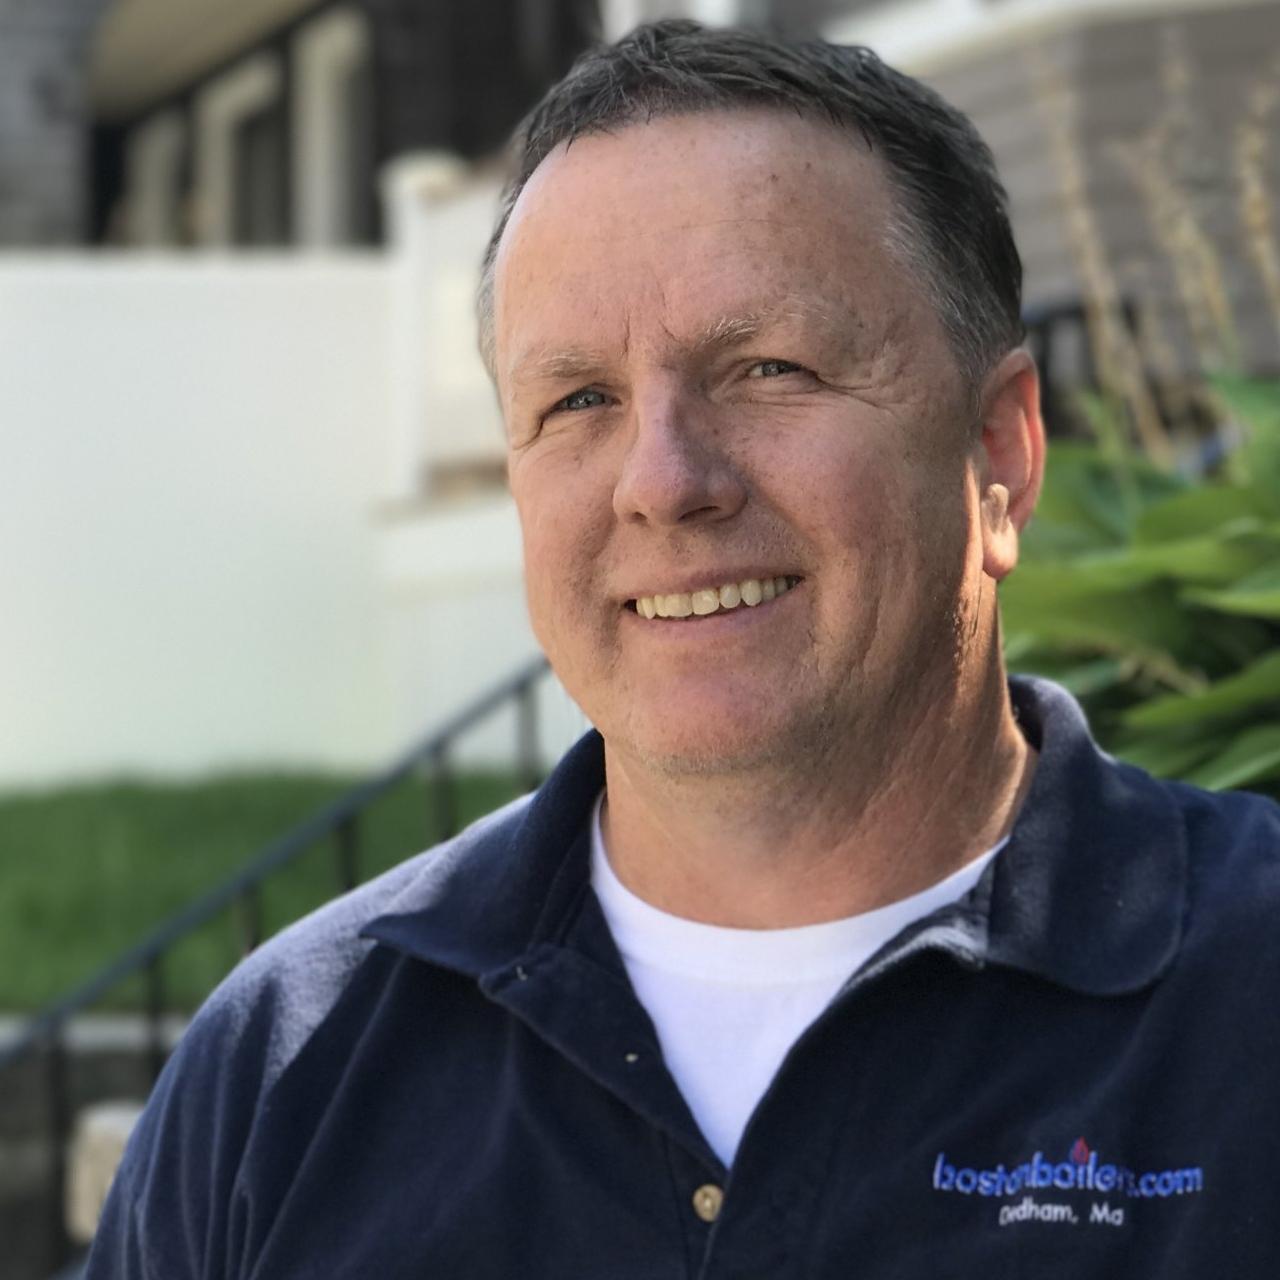 Scott scipione, Founder & President